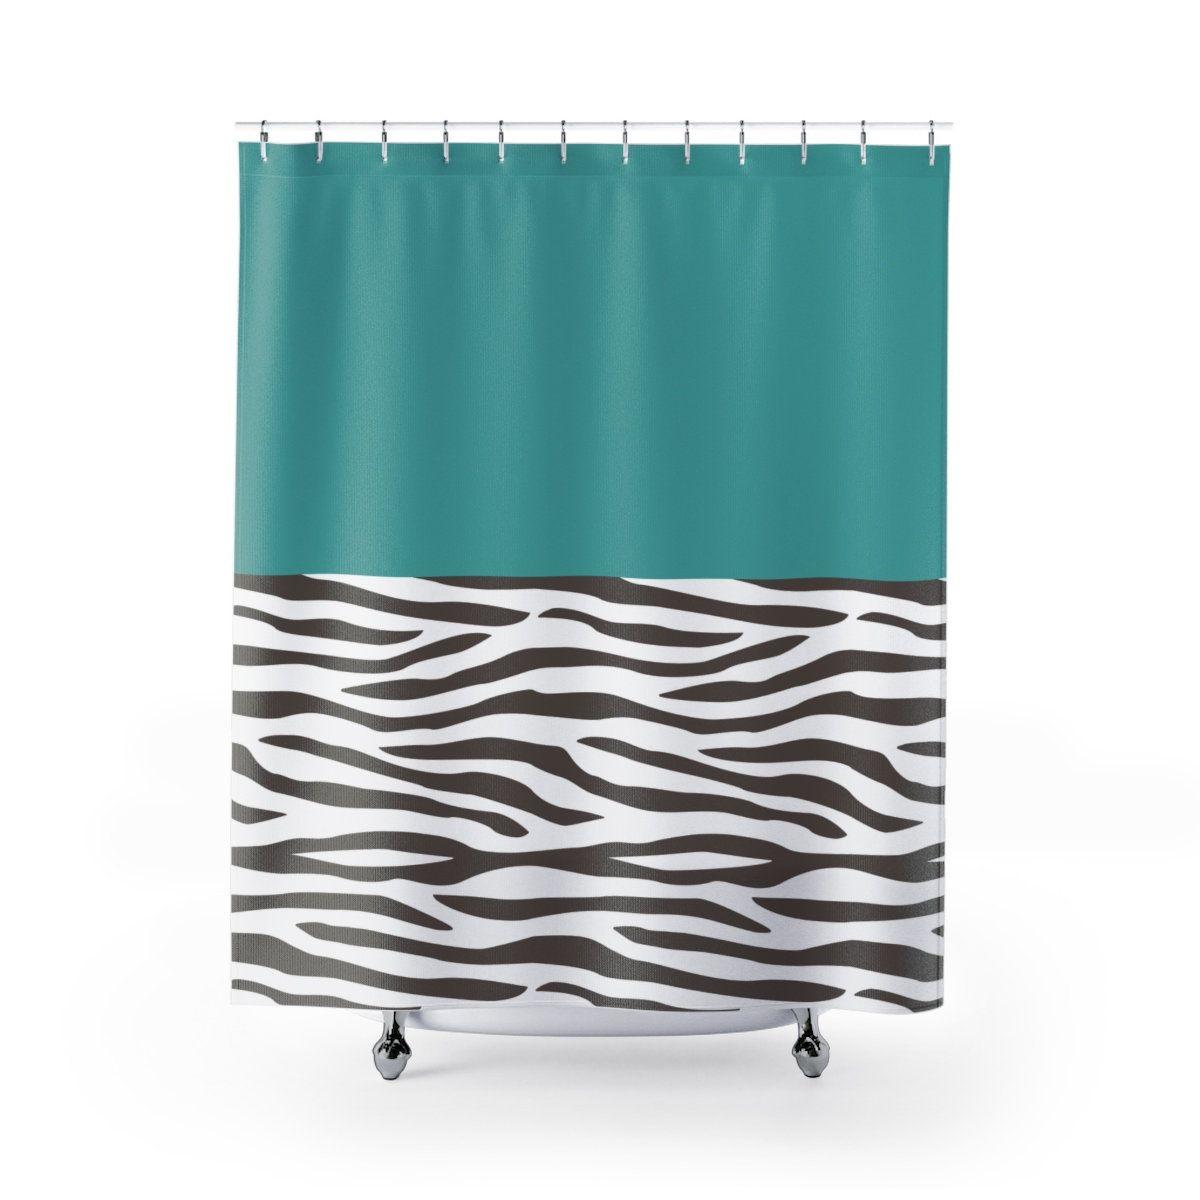 Yellow Bathroomideas: Teal Zebra Pattern Shower Curtain